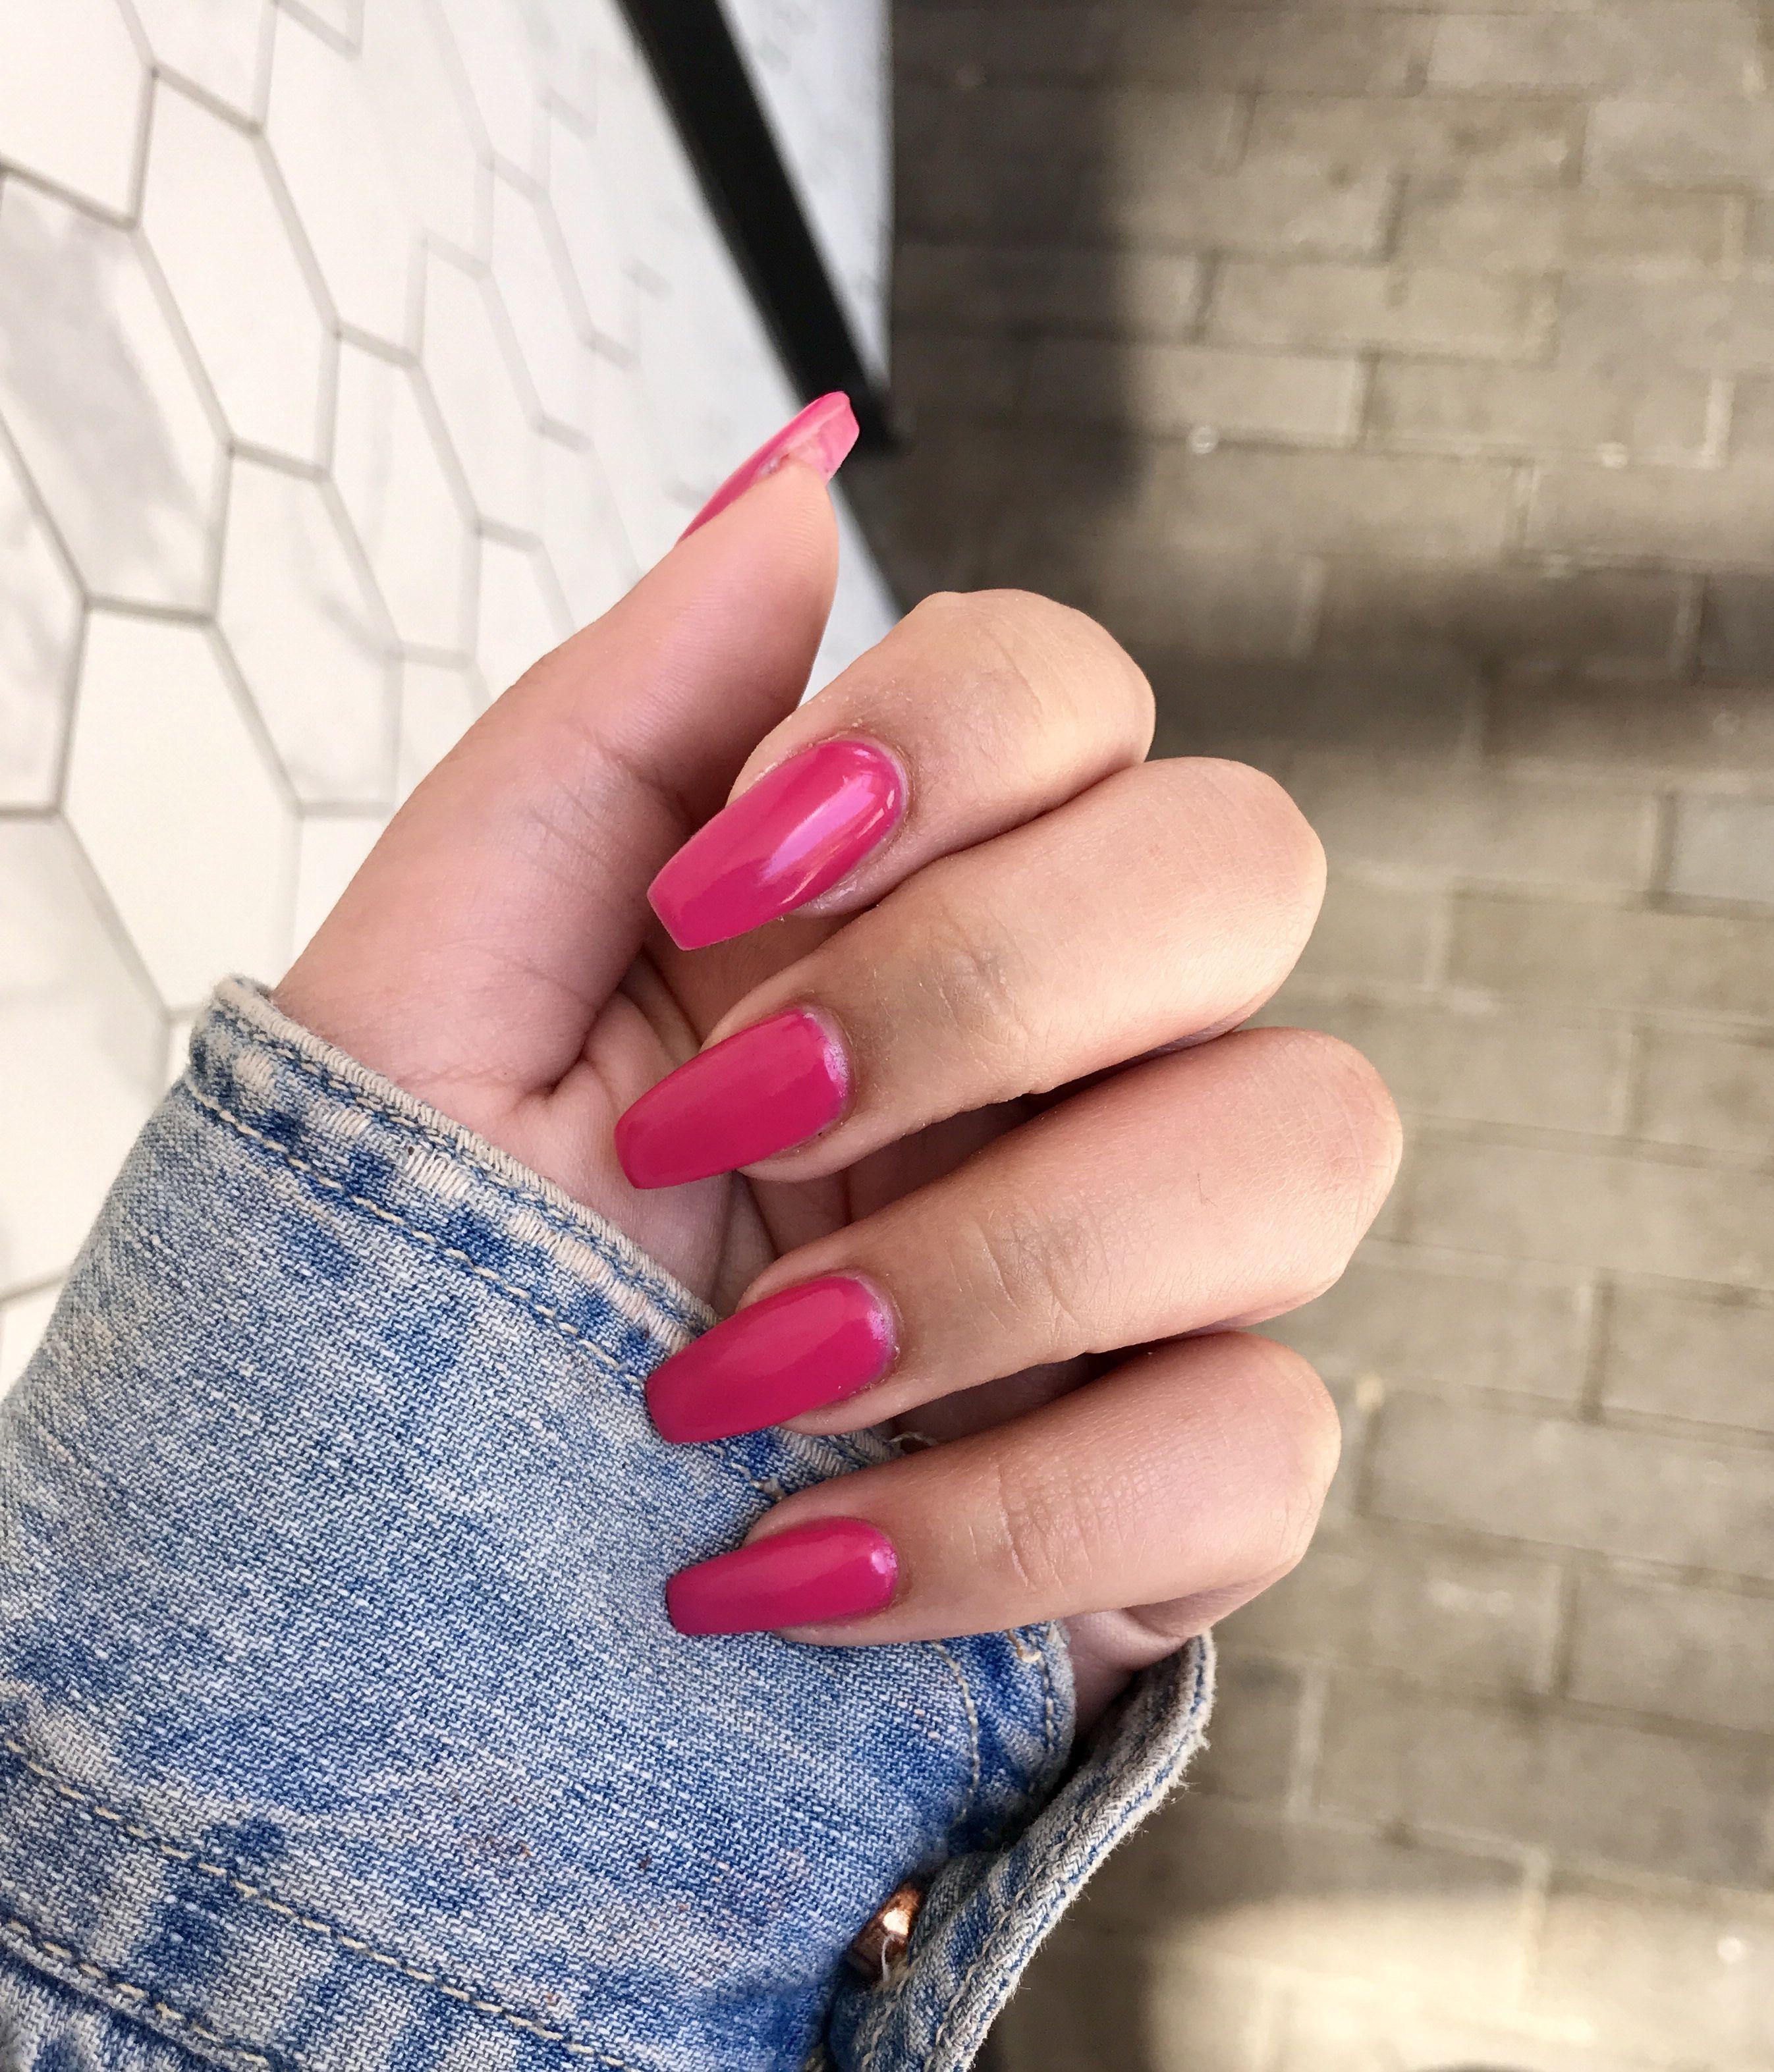 💅🏽🌸 in 2020 | Pink acrylic nails, Acrylic nails, Pink acrylics